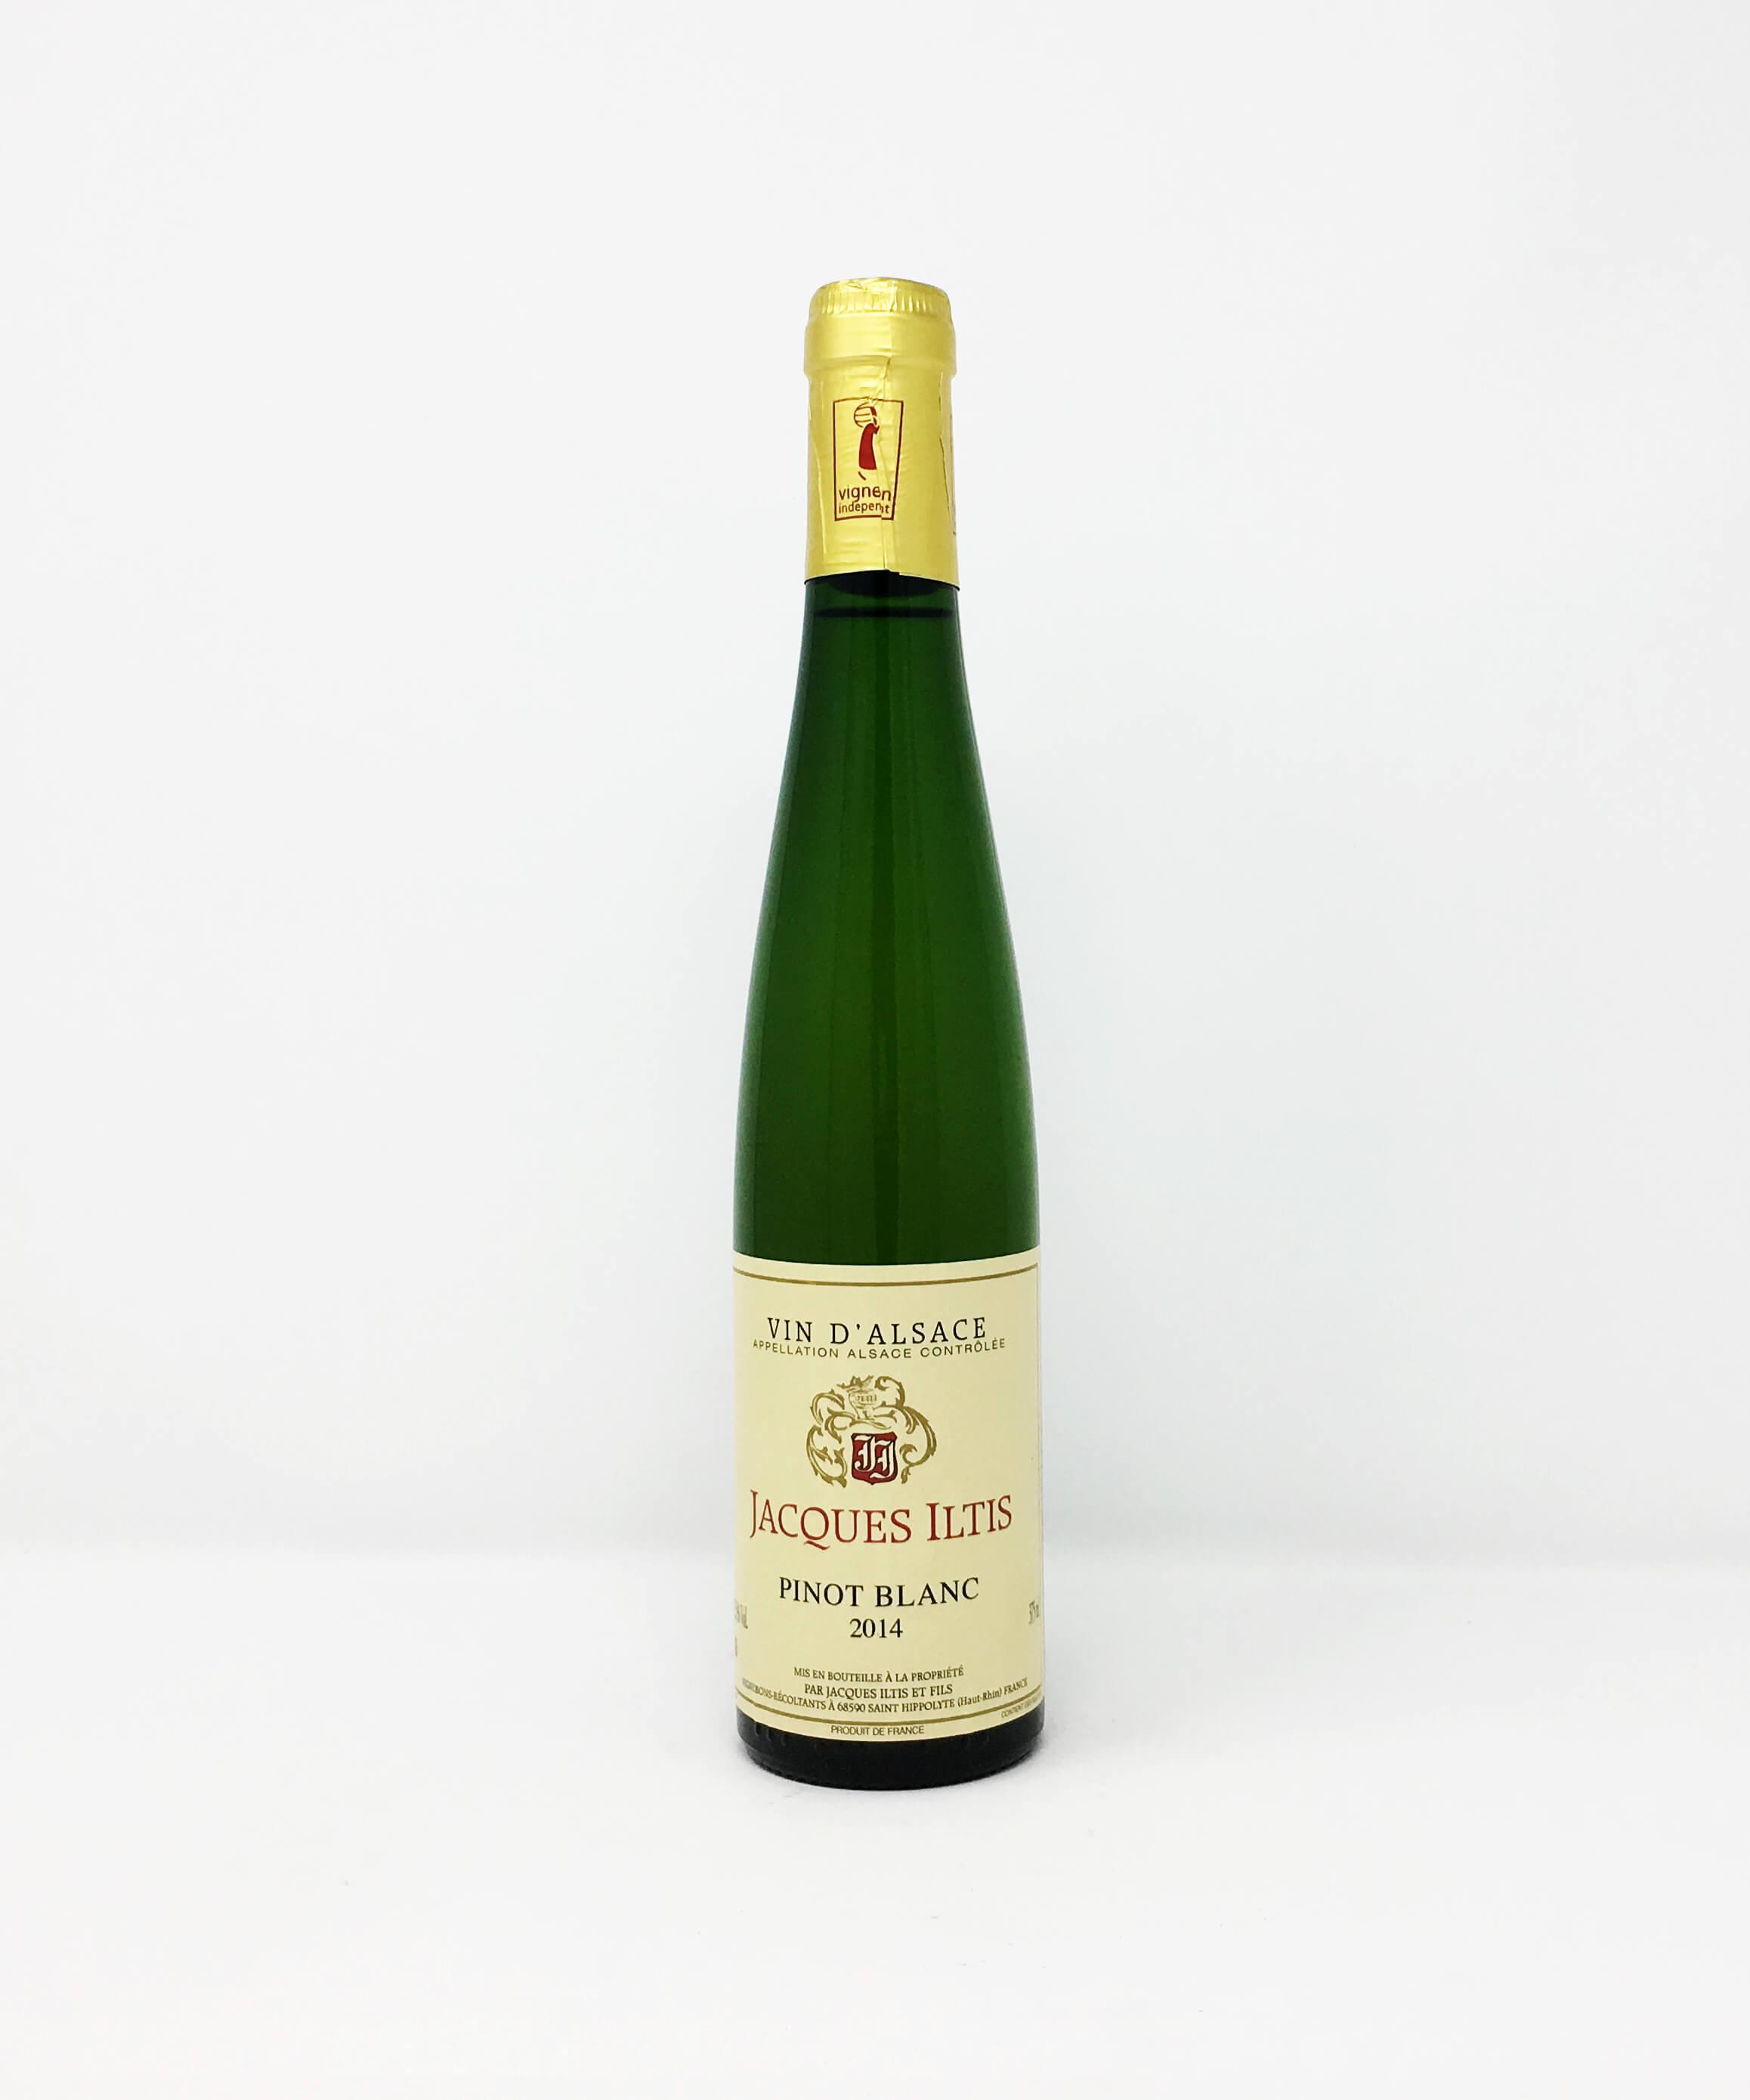 Jacques Iltis, Pinot Blanc HALF BOTTLE